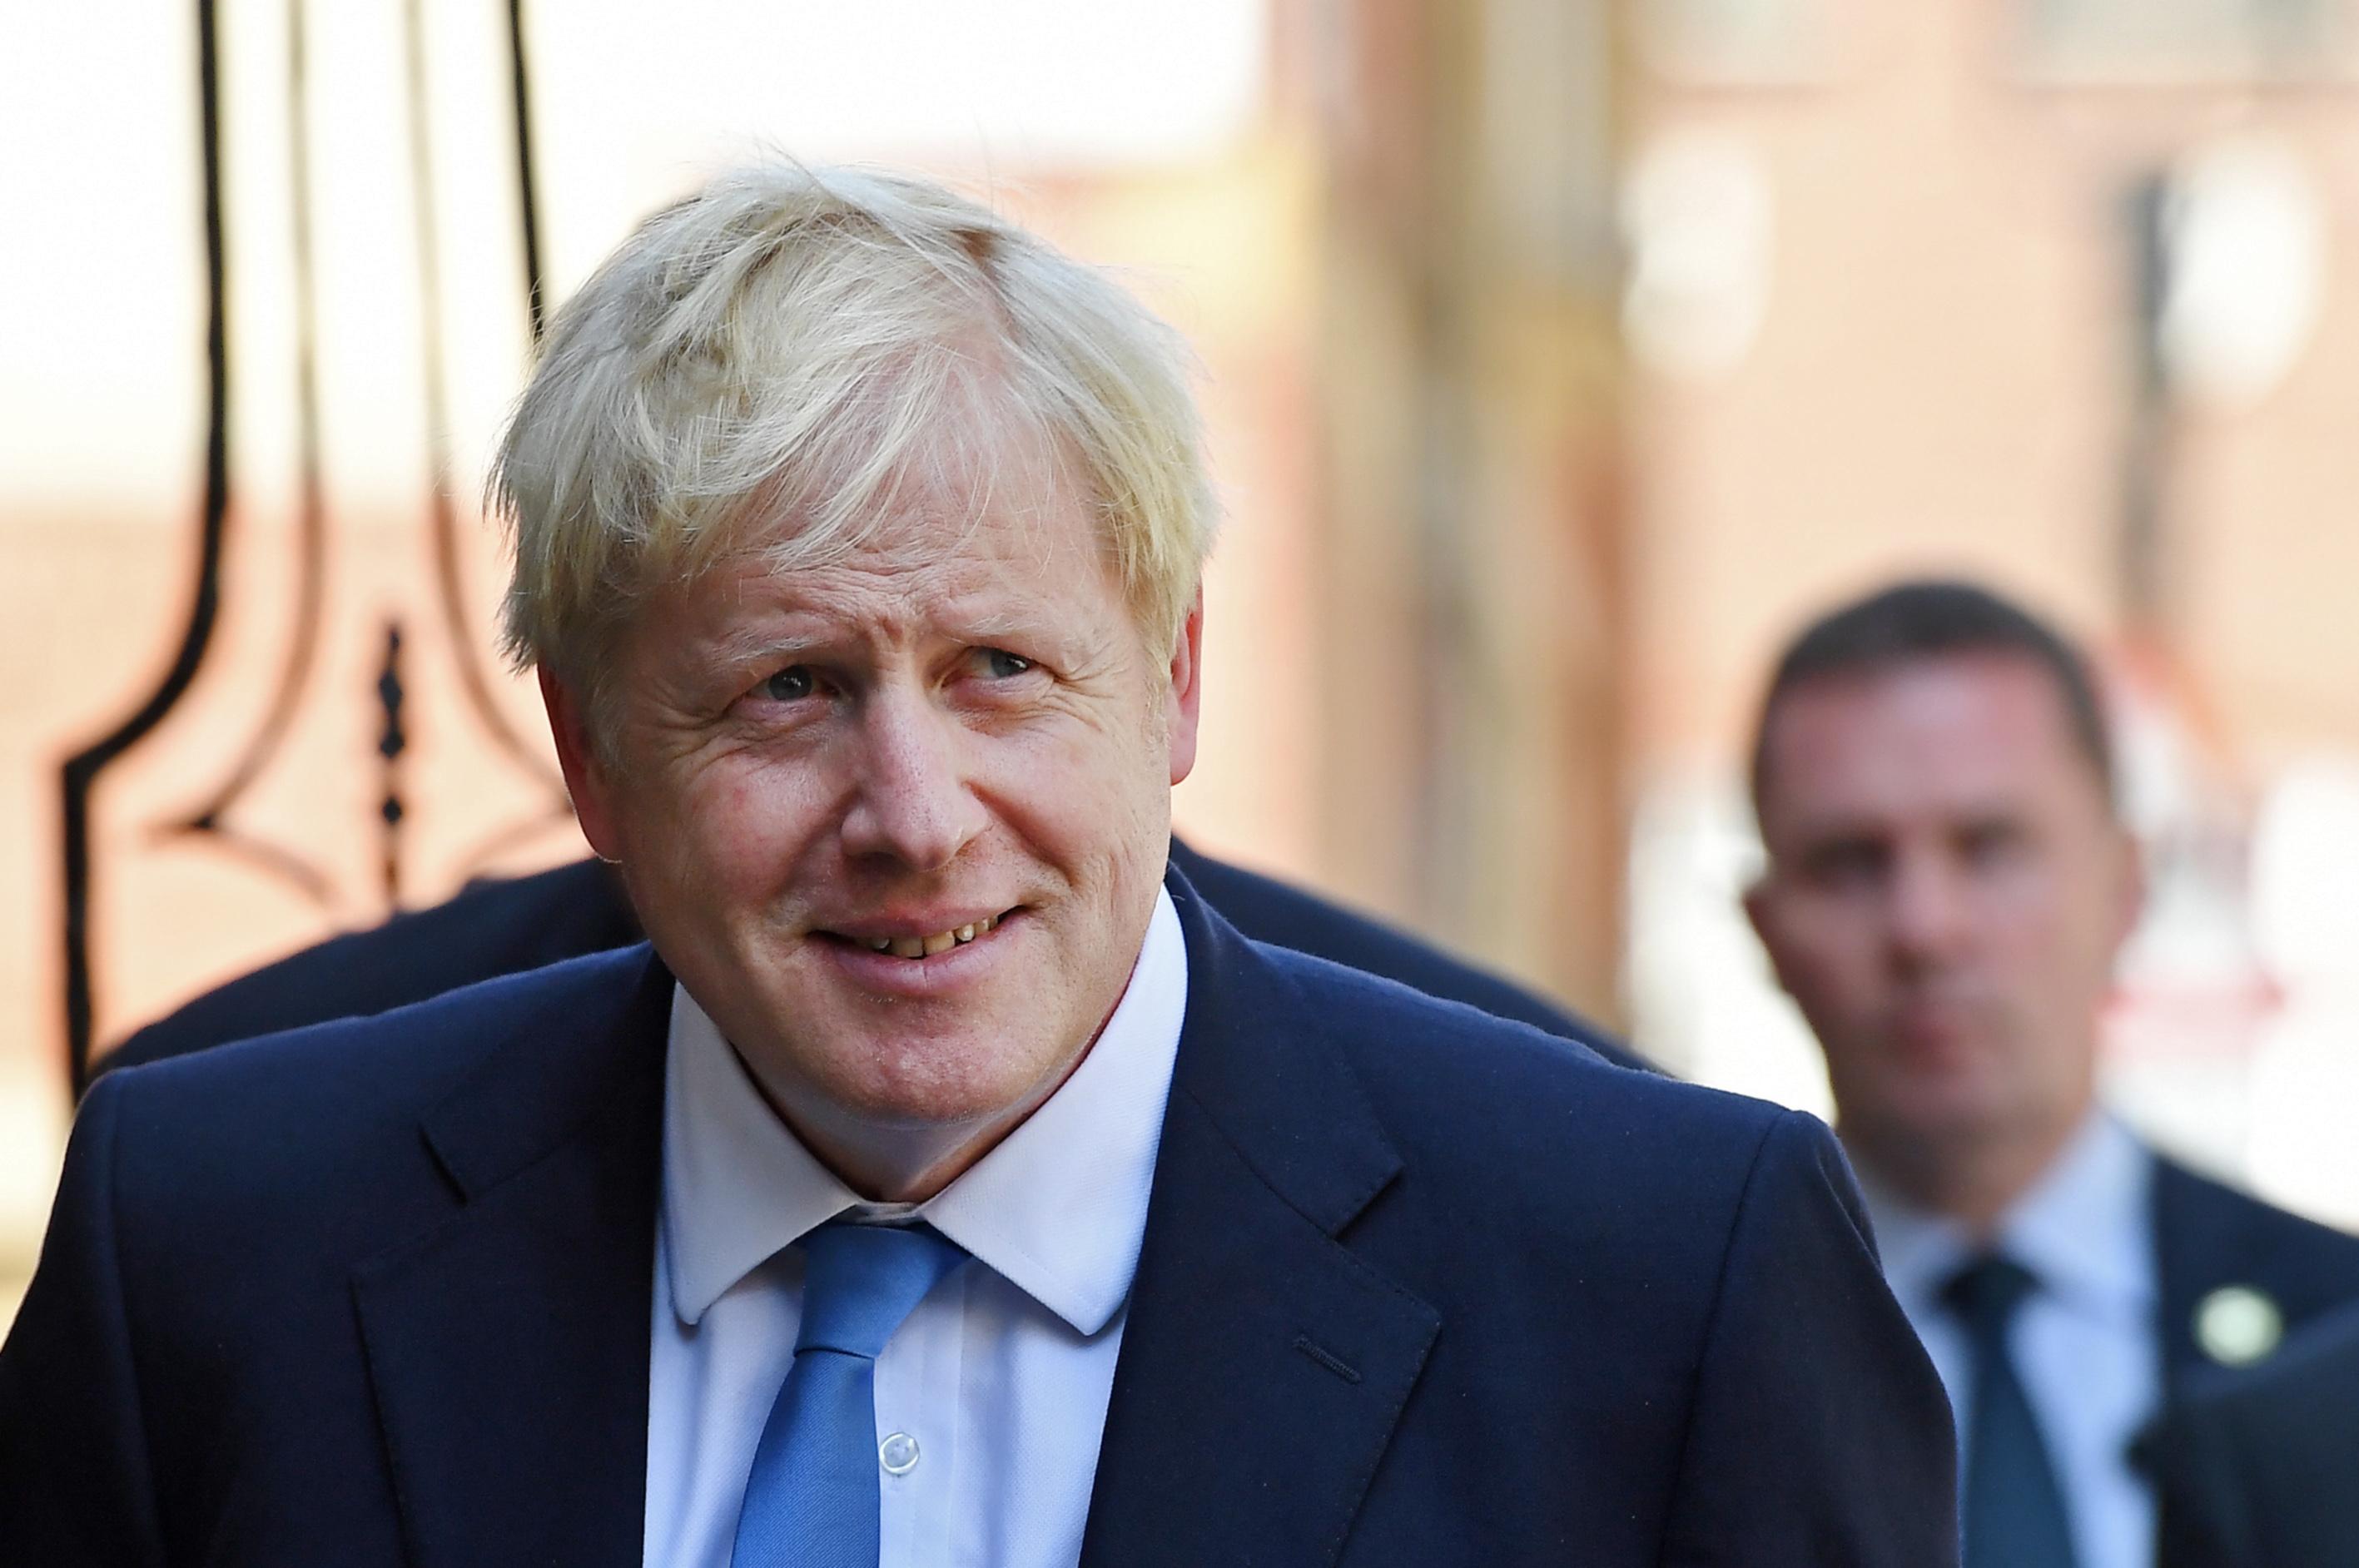 Boris Johnson announced leader of Britain's Conservative Party